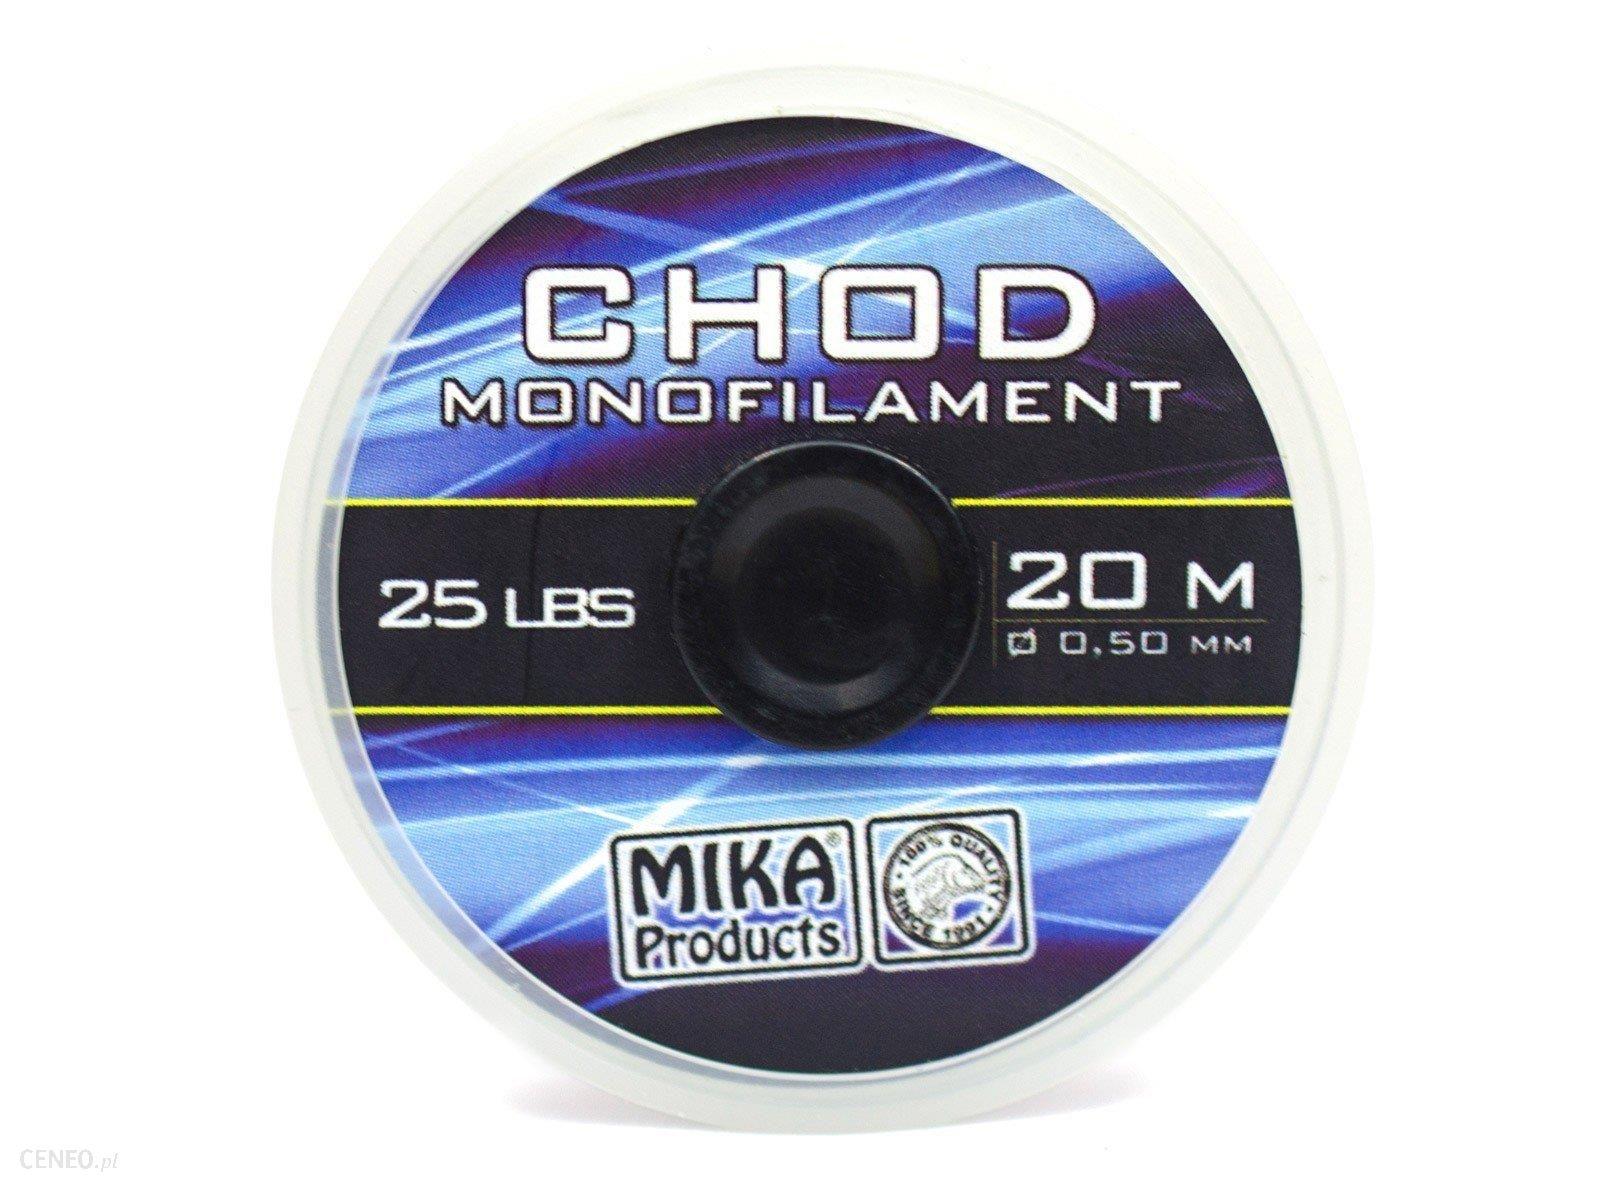 Mika Products Chod Mono 25 Lbs 20M